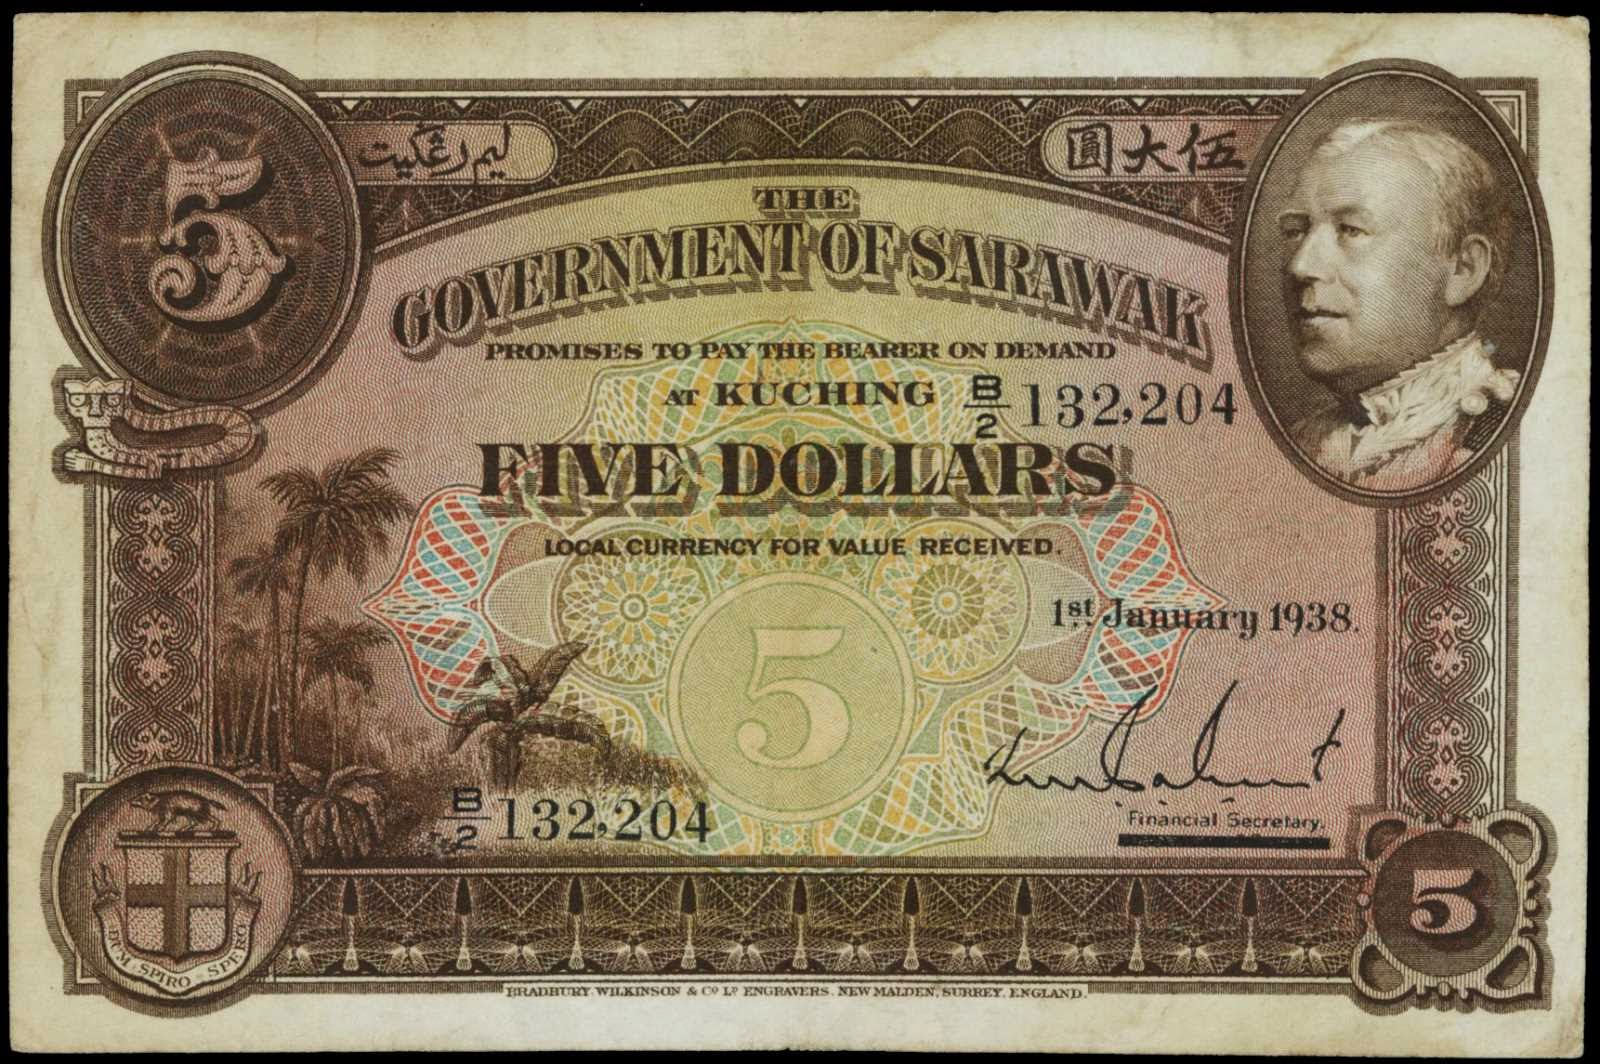 Sarawak banknotes 5 Dollars note 1938 Charles Vyner Brooke